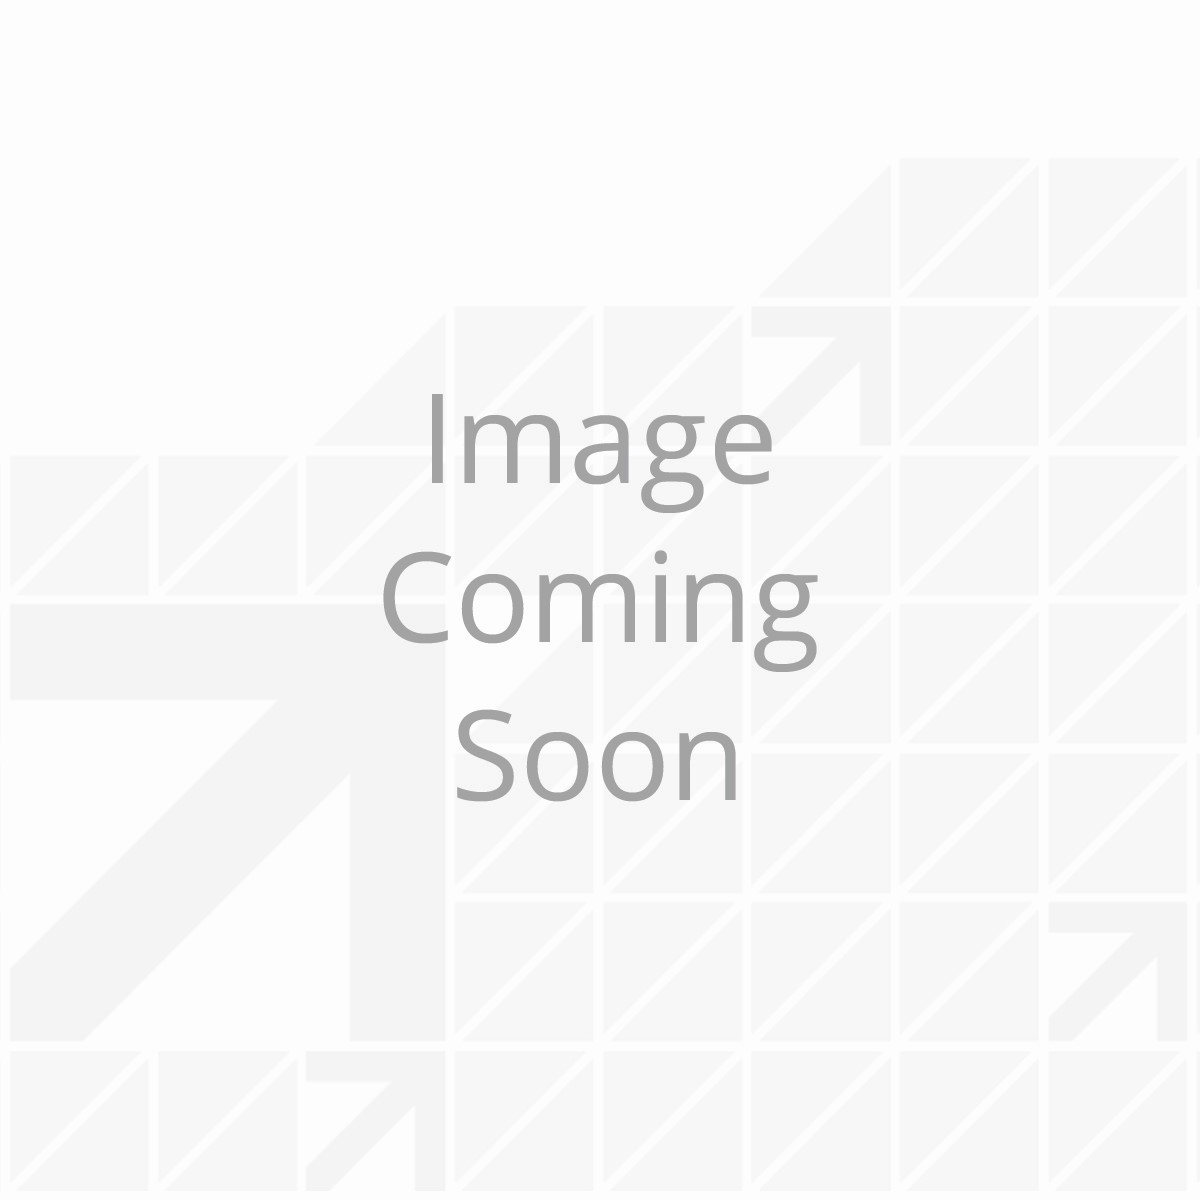 1010 Low VOC Non-Sag Sealant, Black (10.3 Oz. Tube)